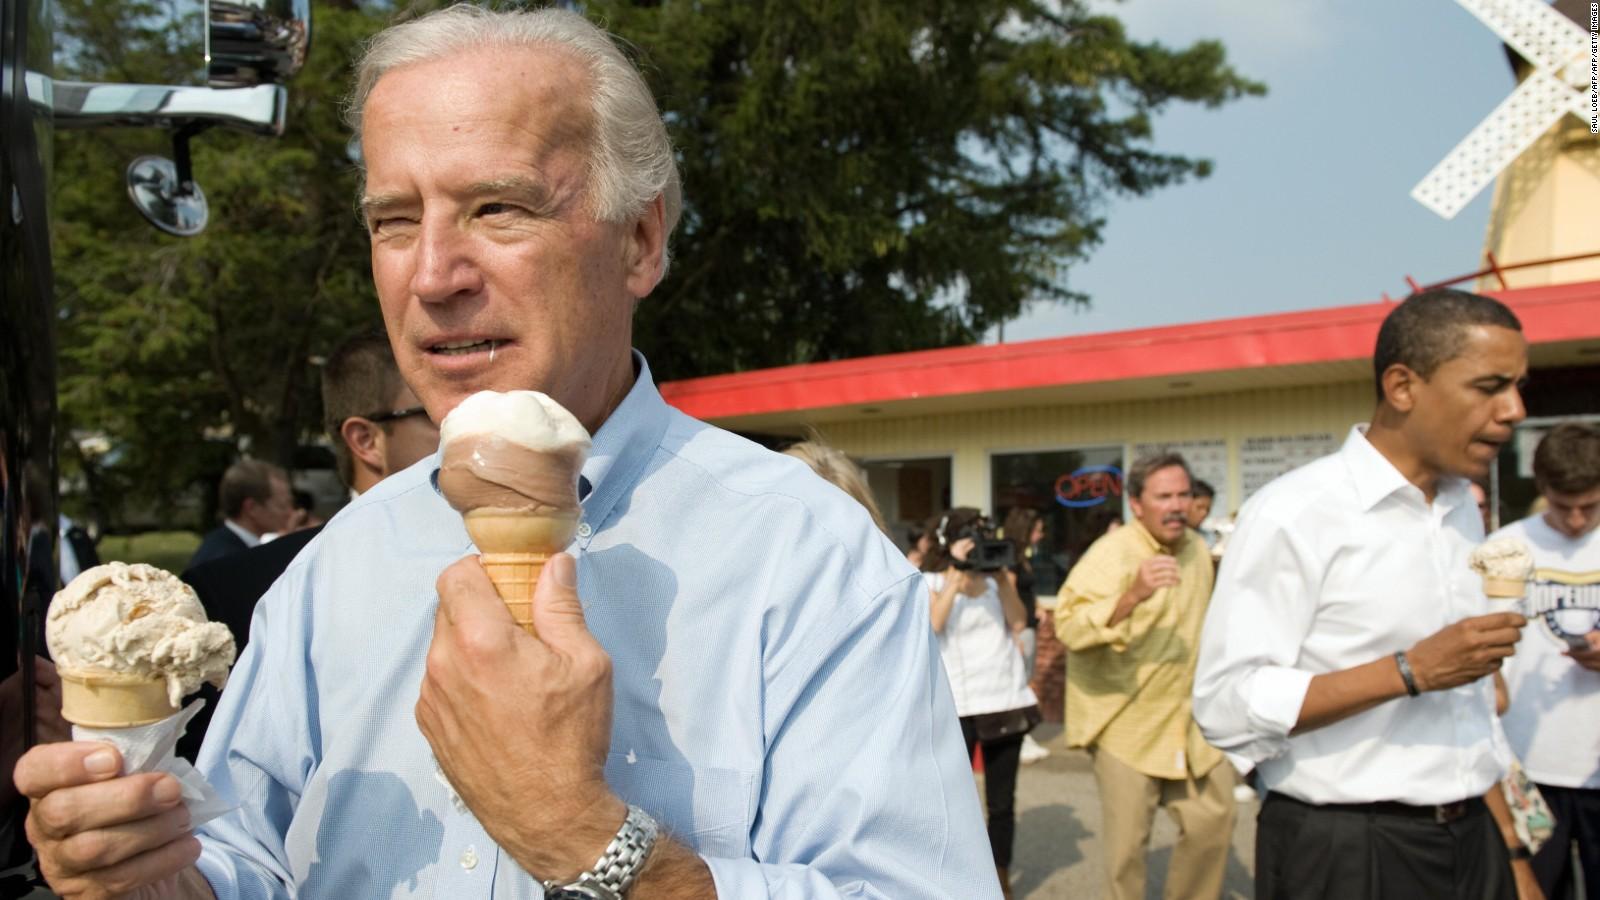 161220135408-joe-biden-ice-cream-2-full-169.jpg